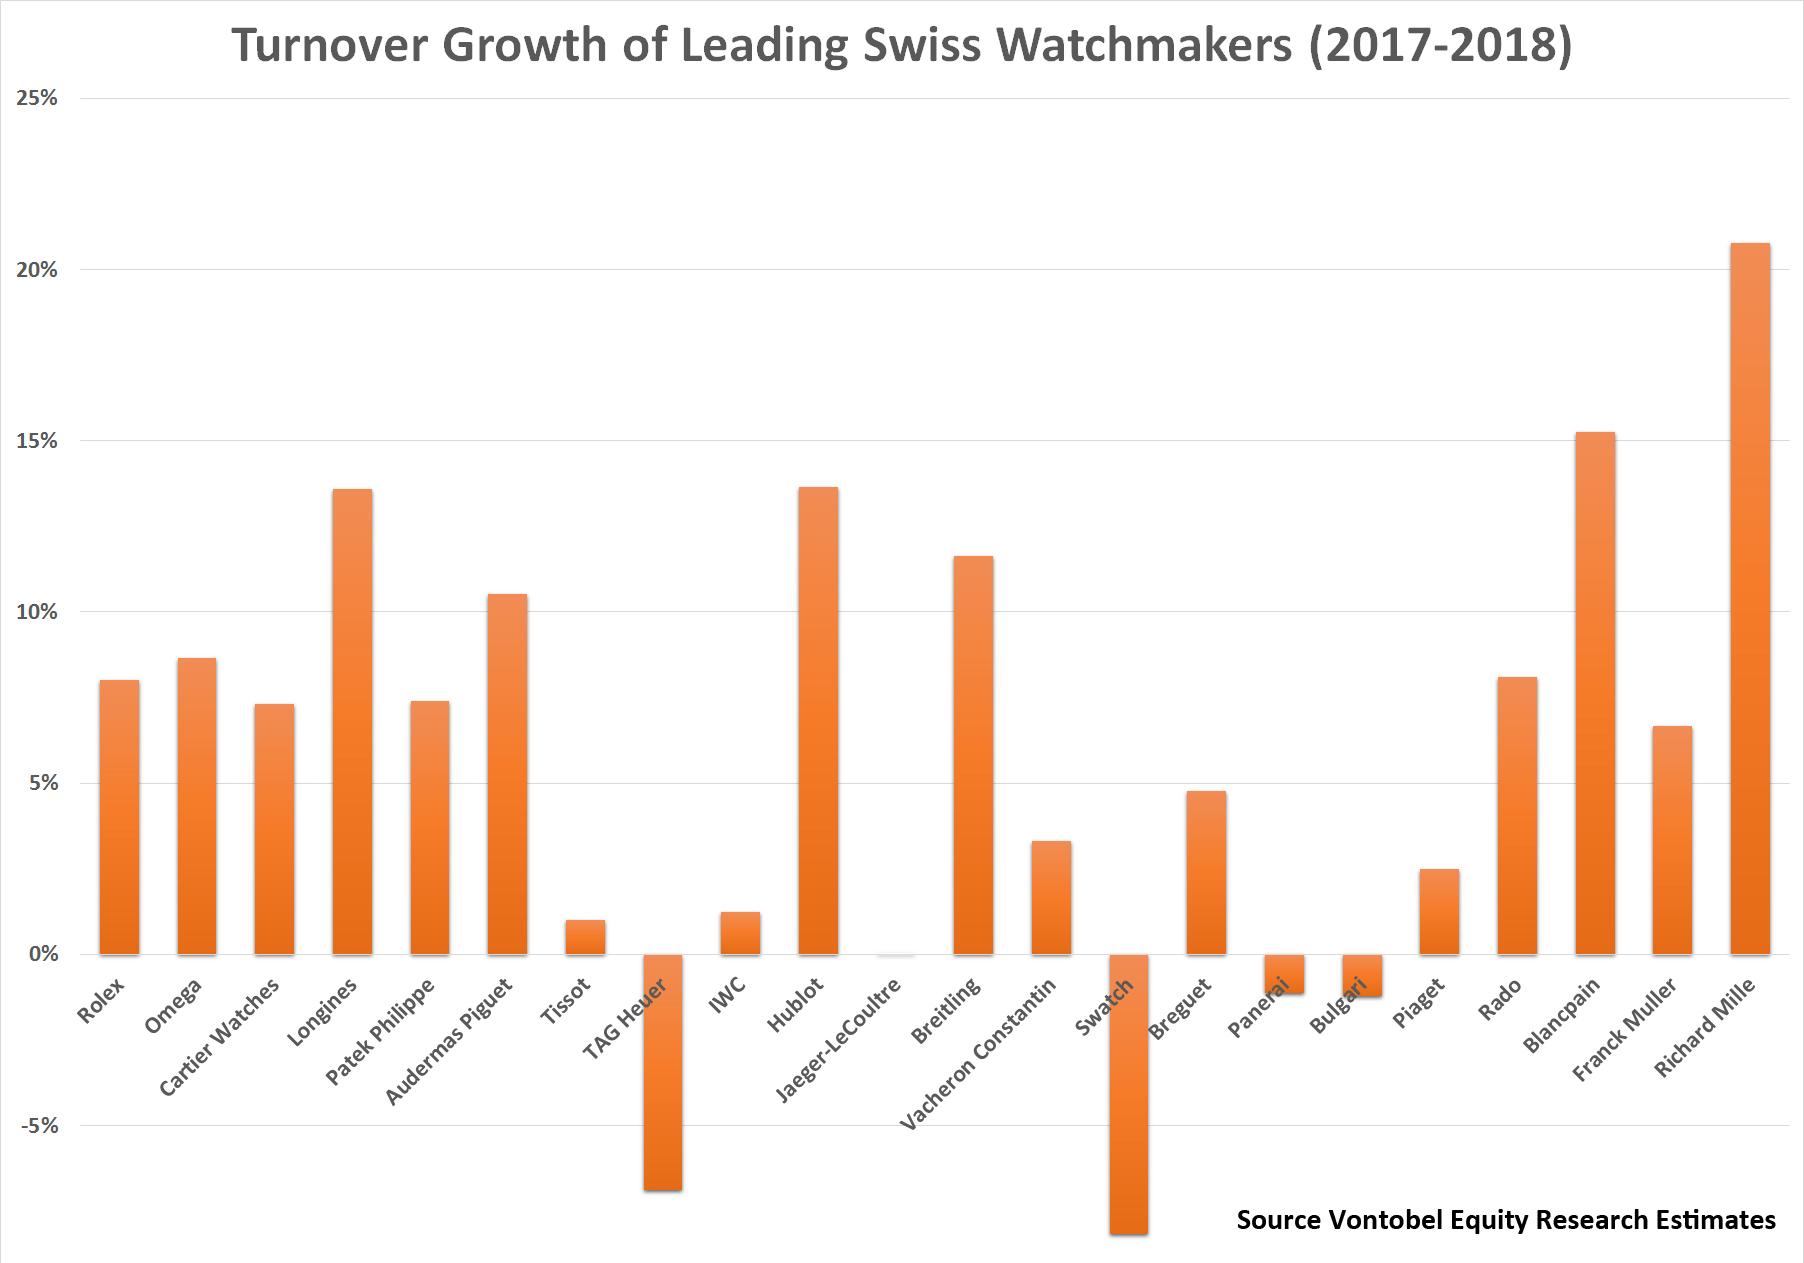 Growth rates of Swiss watch brands 2017-18 Vontobel